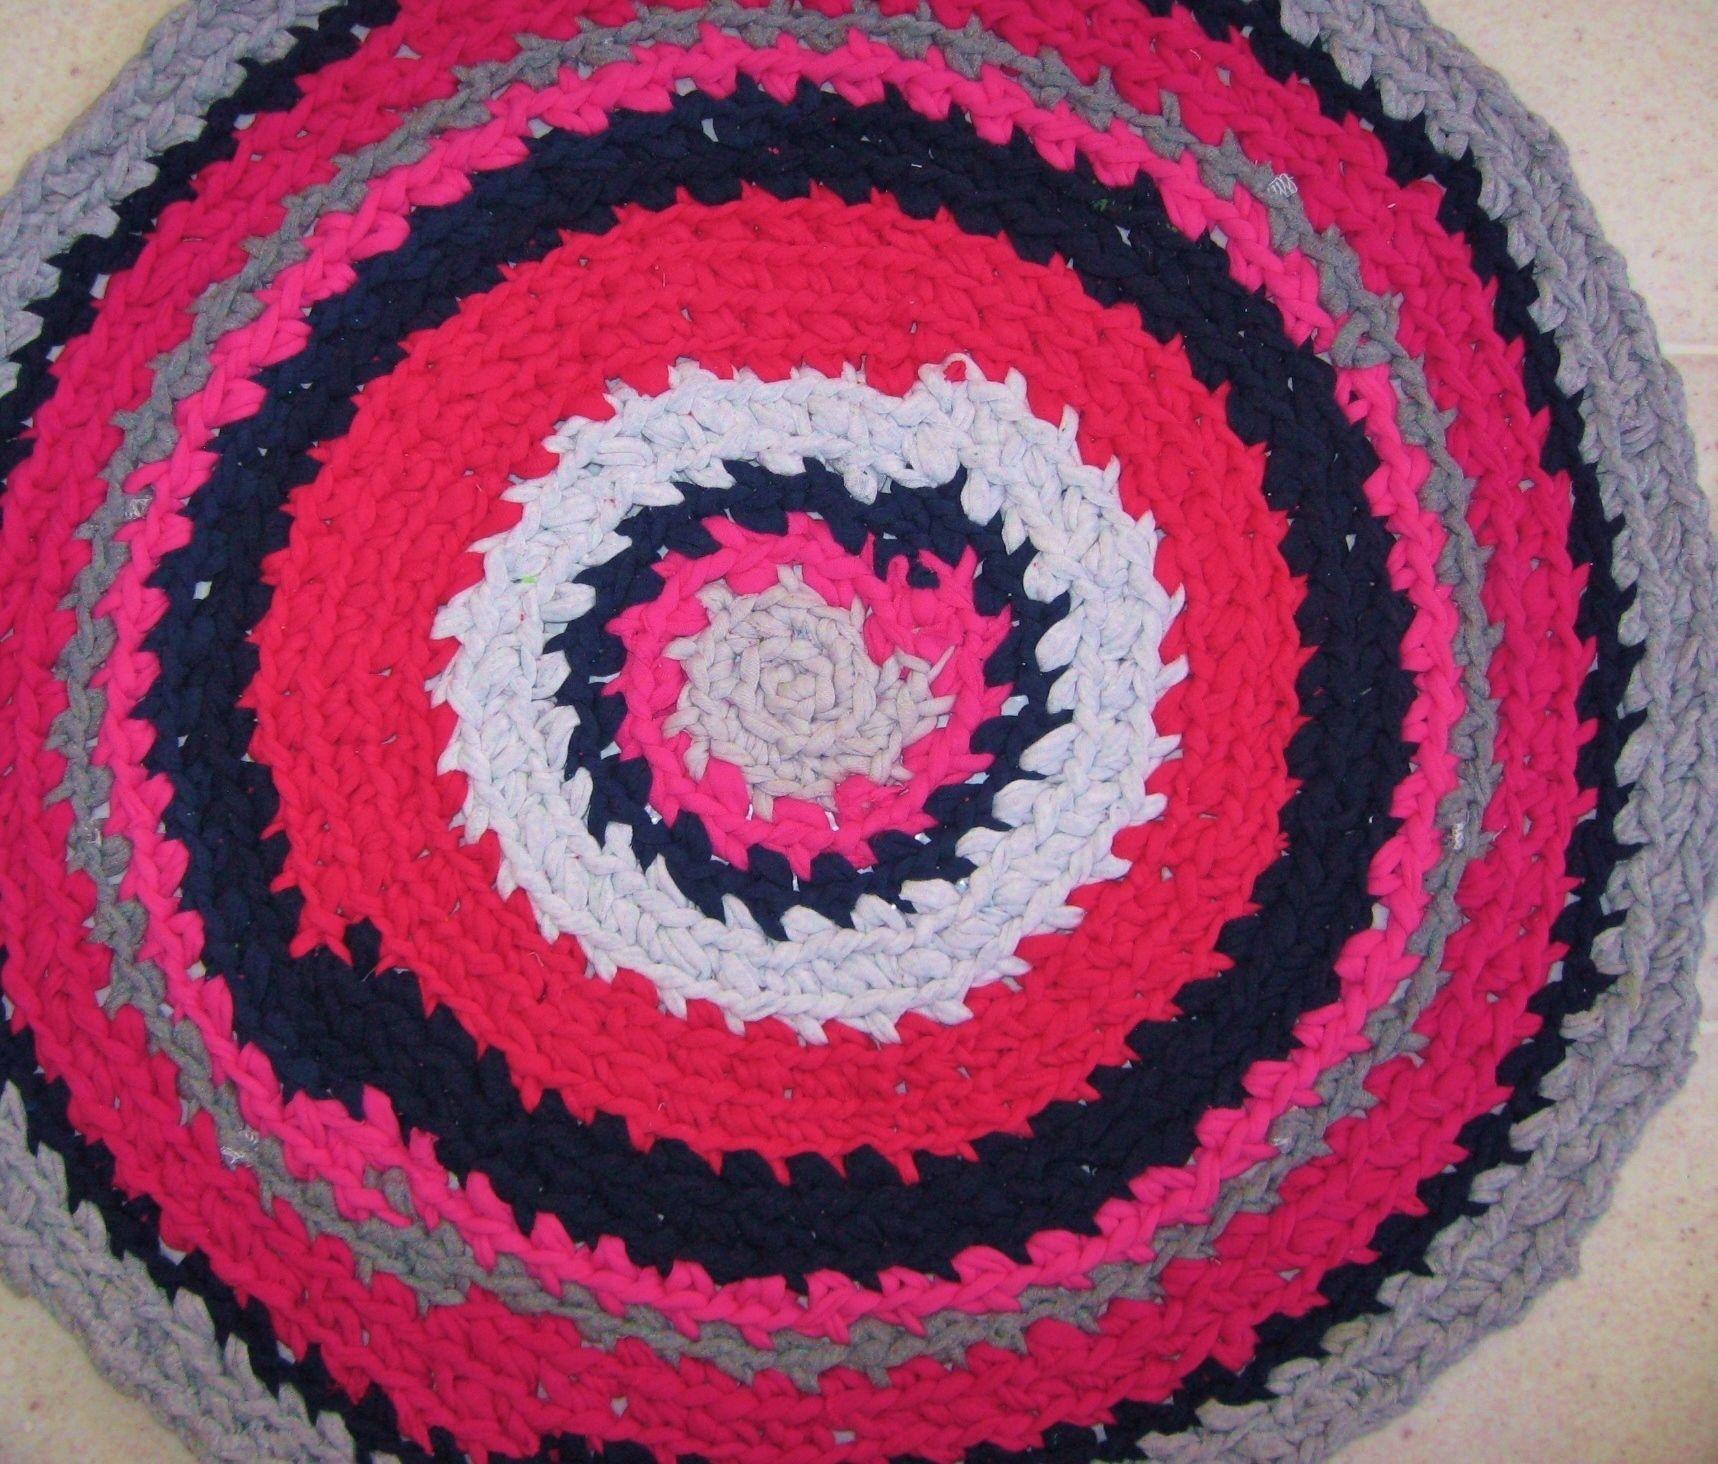 Recycled T Shirt Yarn Crocheted Rug